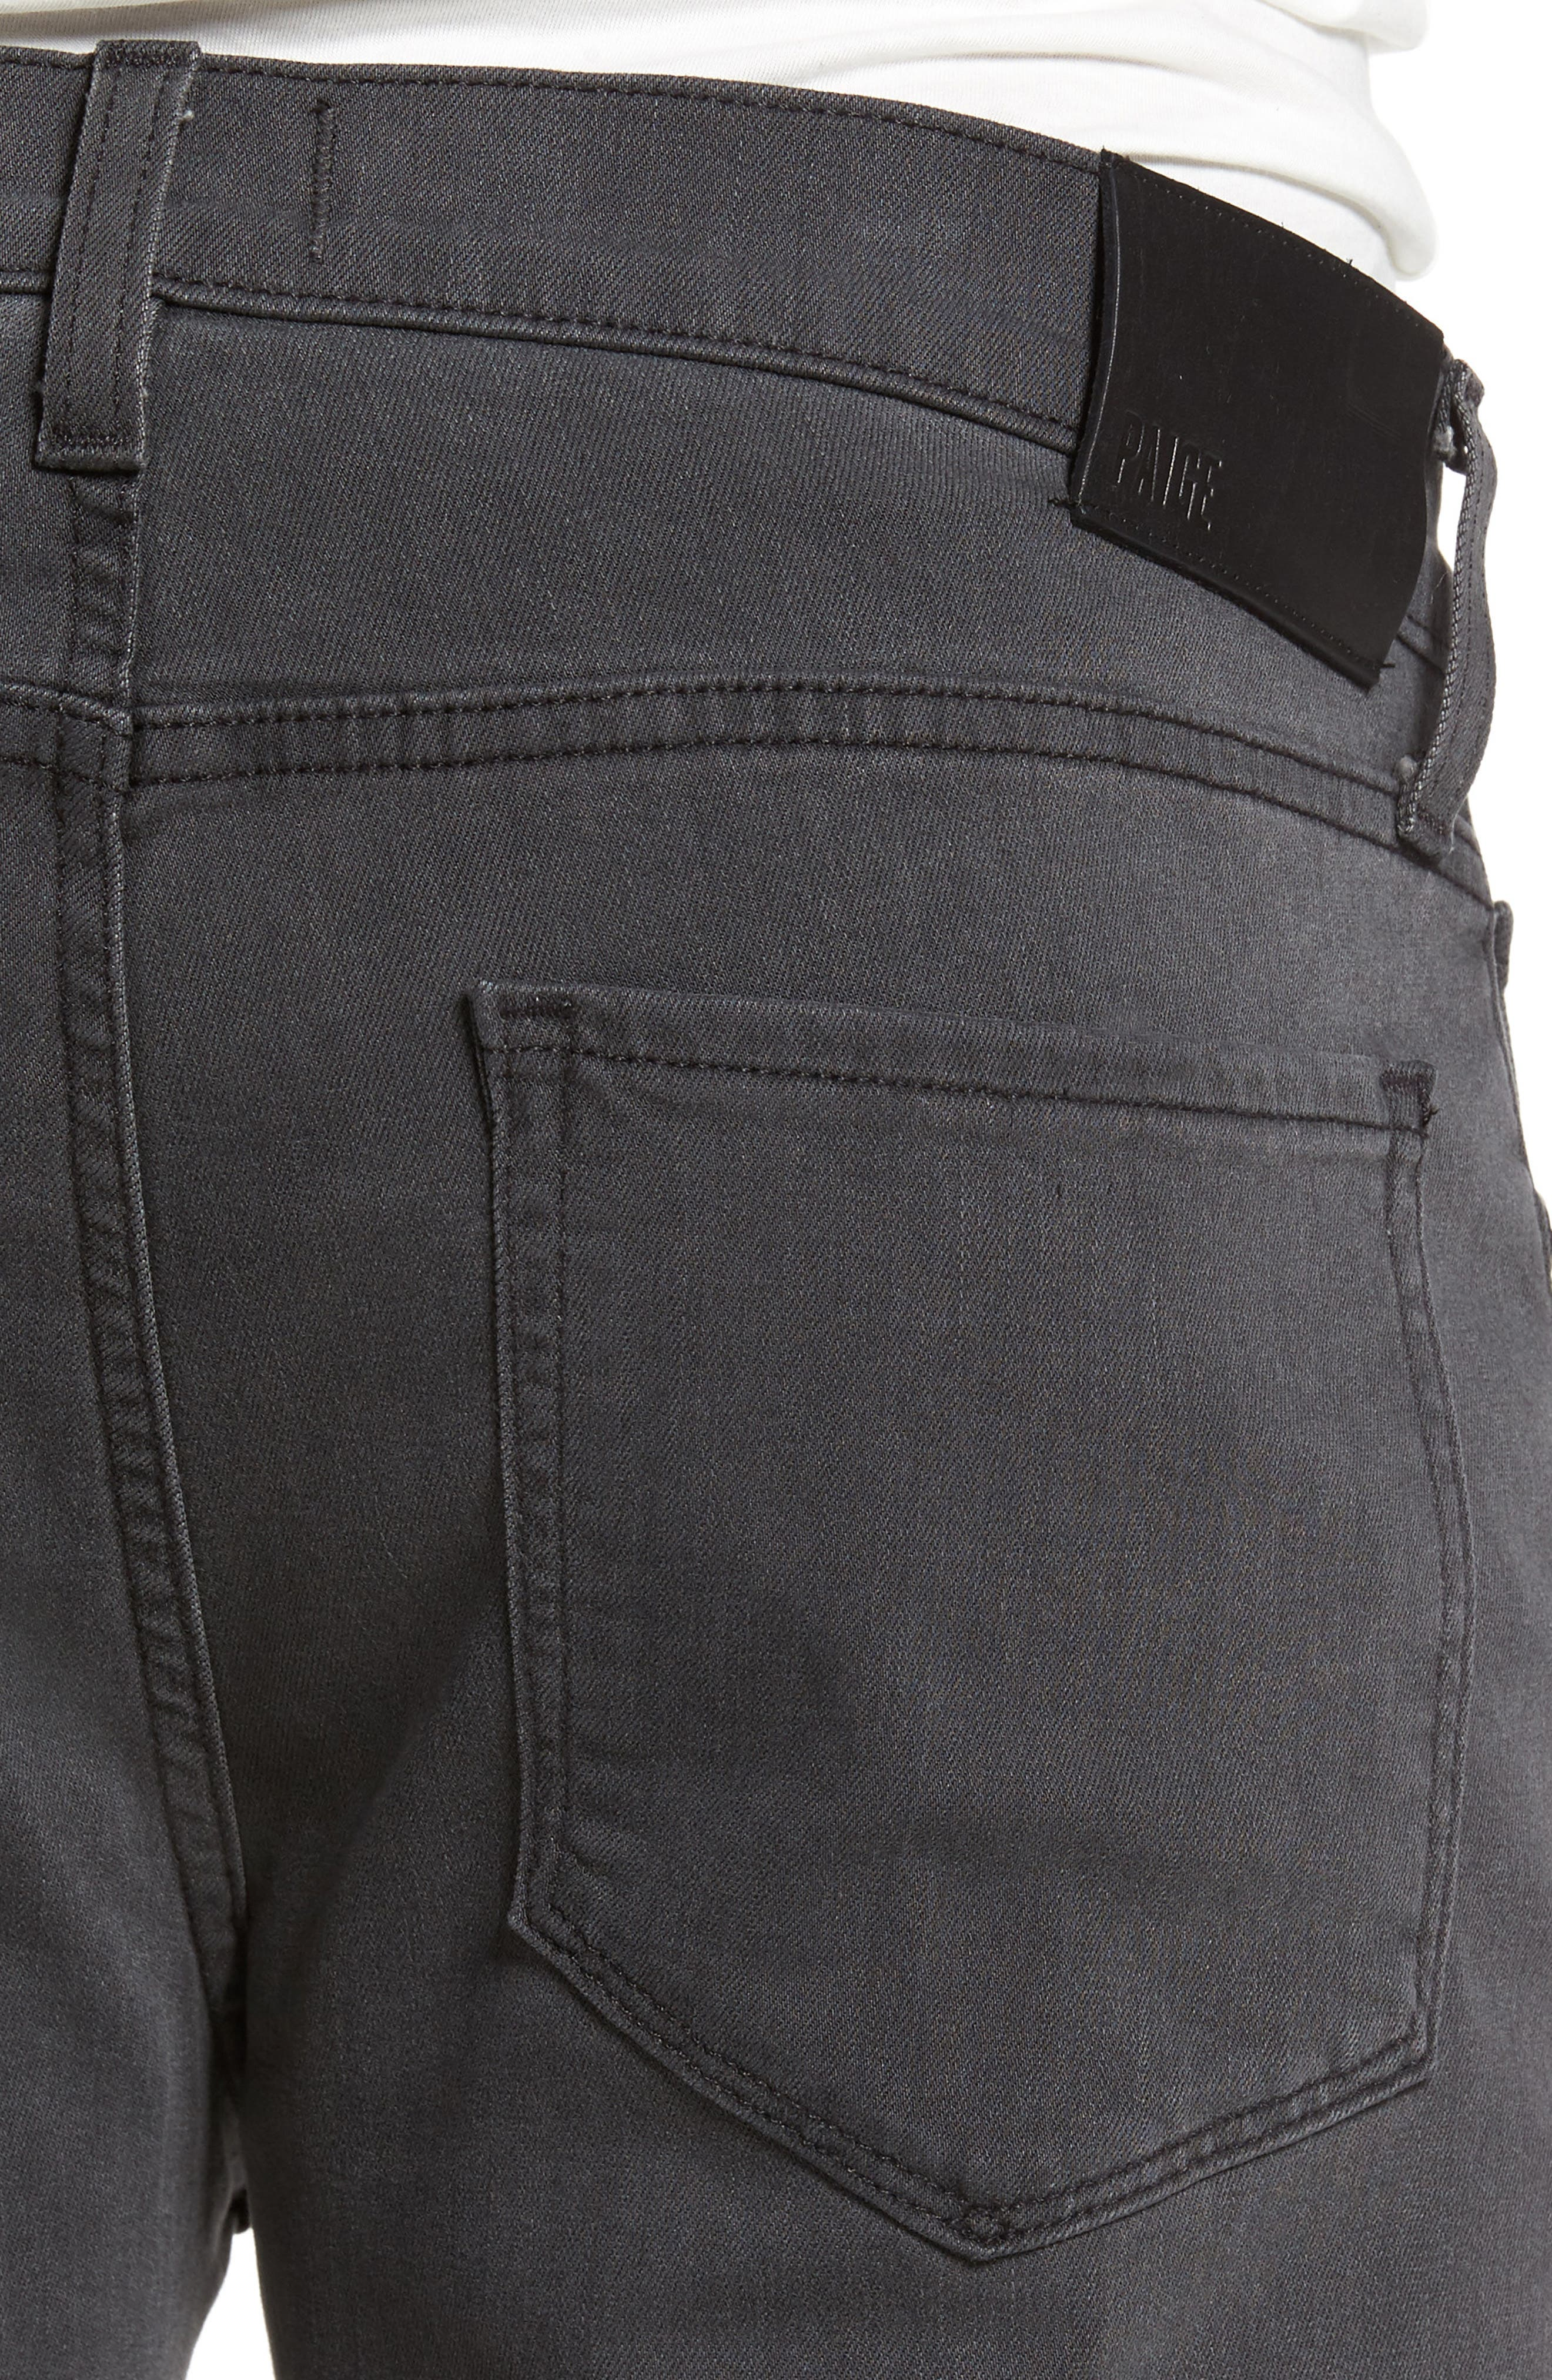 Transcend - Lennox Slim Fit Jeans,                             Alternate thumbnail 4, color,                             020